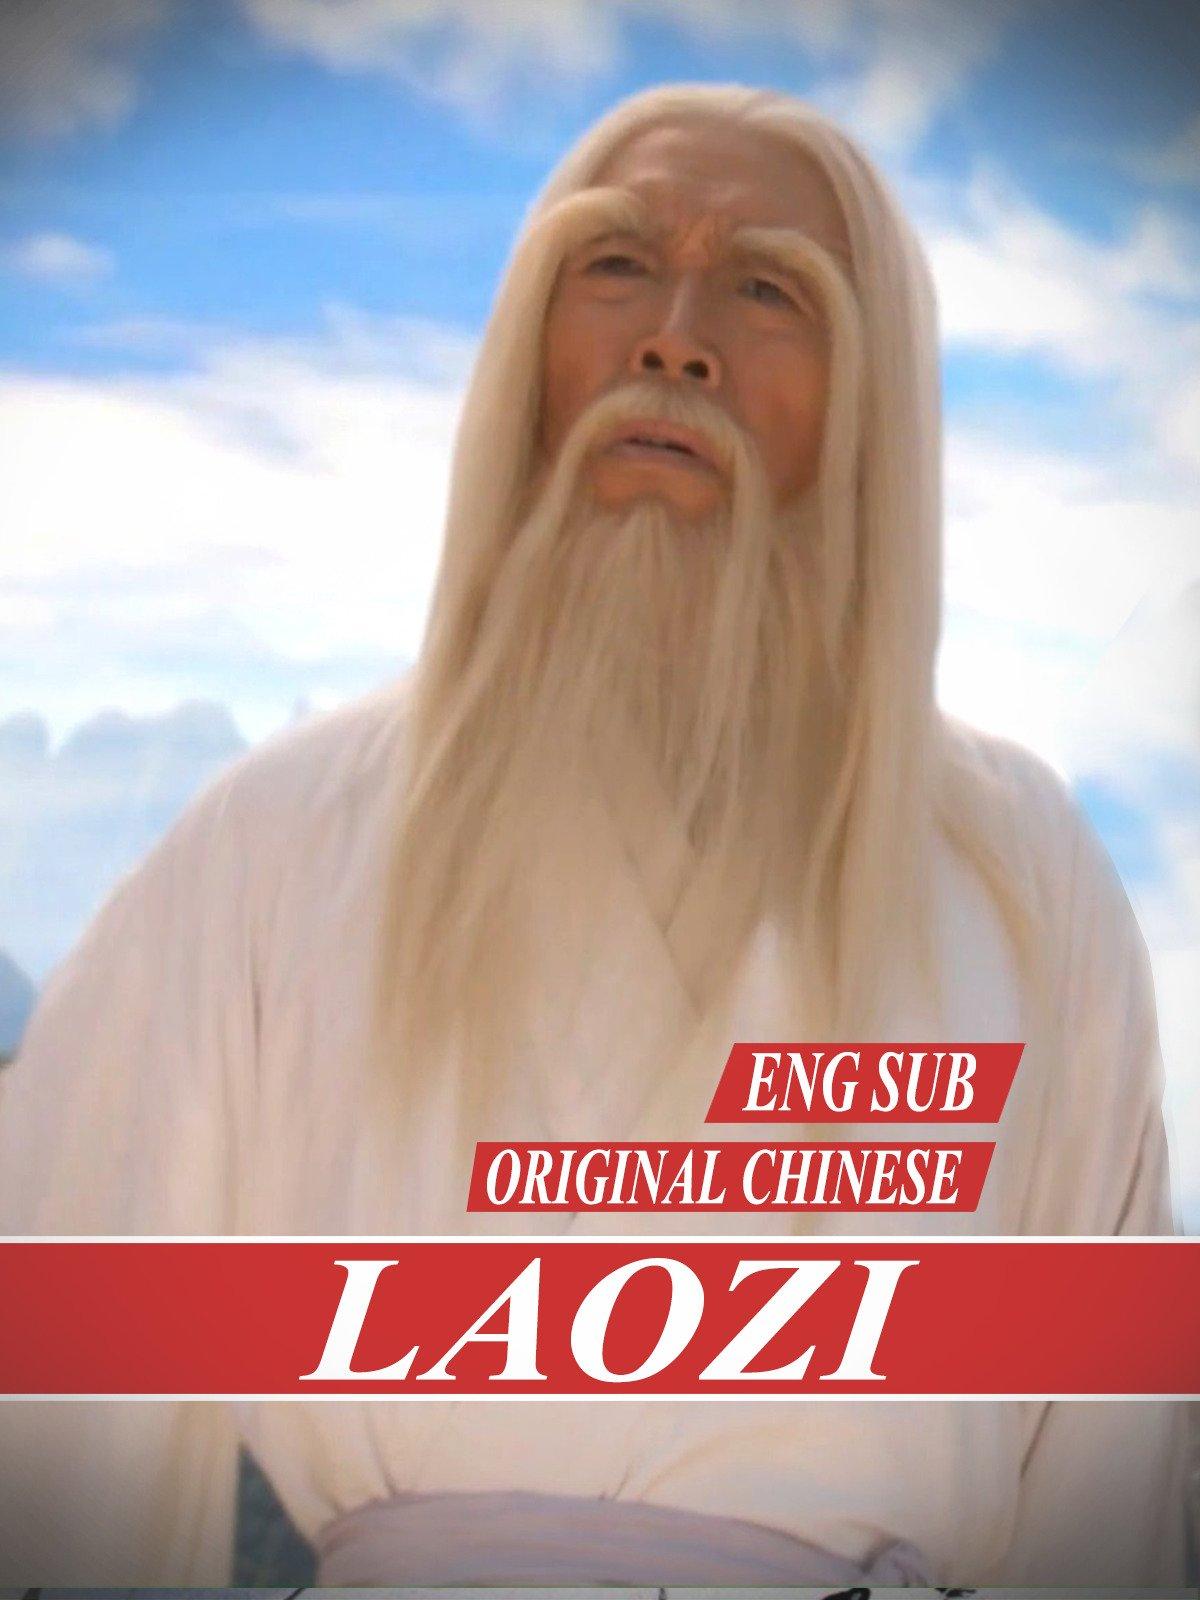 Laozi [Eng Sub] original Chinese